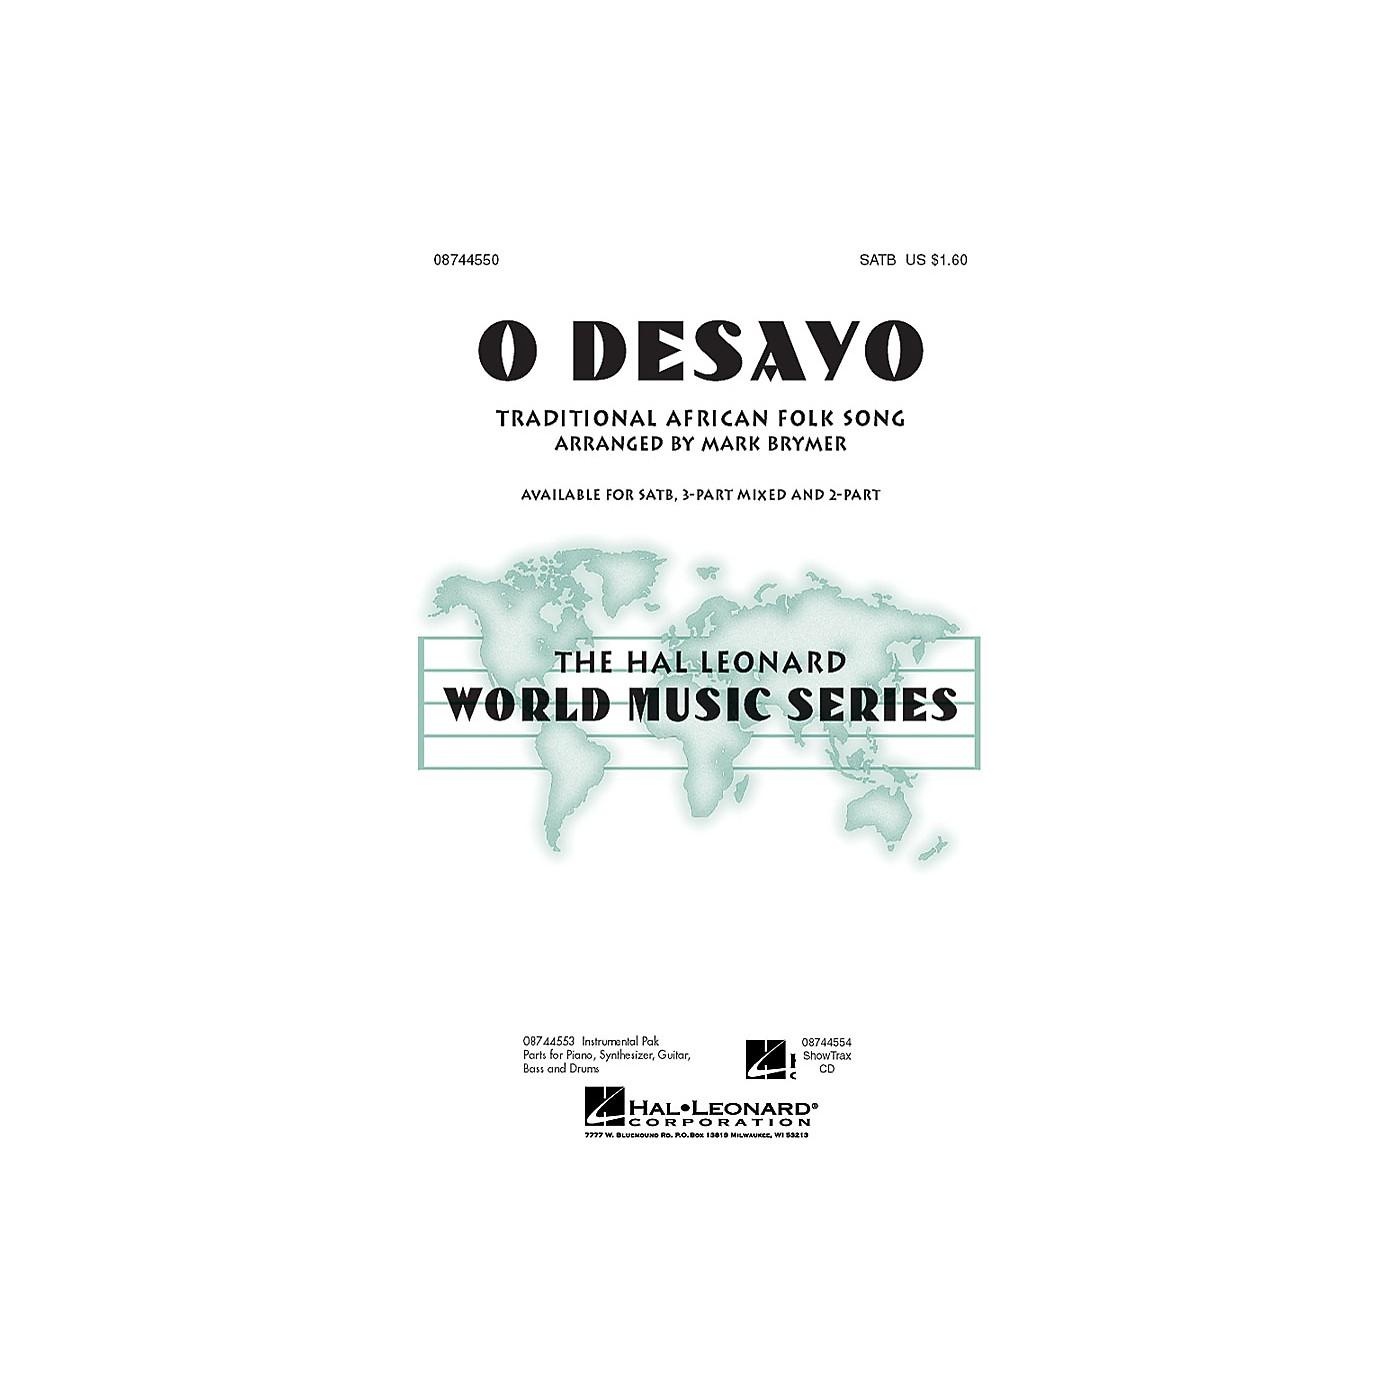 Hal Leonard O Desayo 3-Part Mixed Arranged by Mark Brymer thumbnail